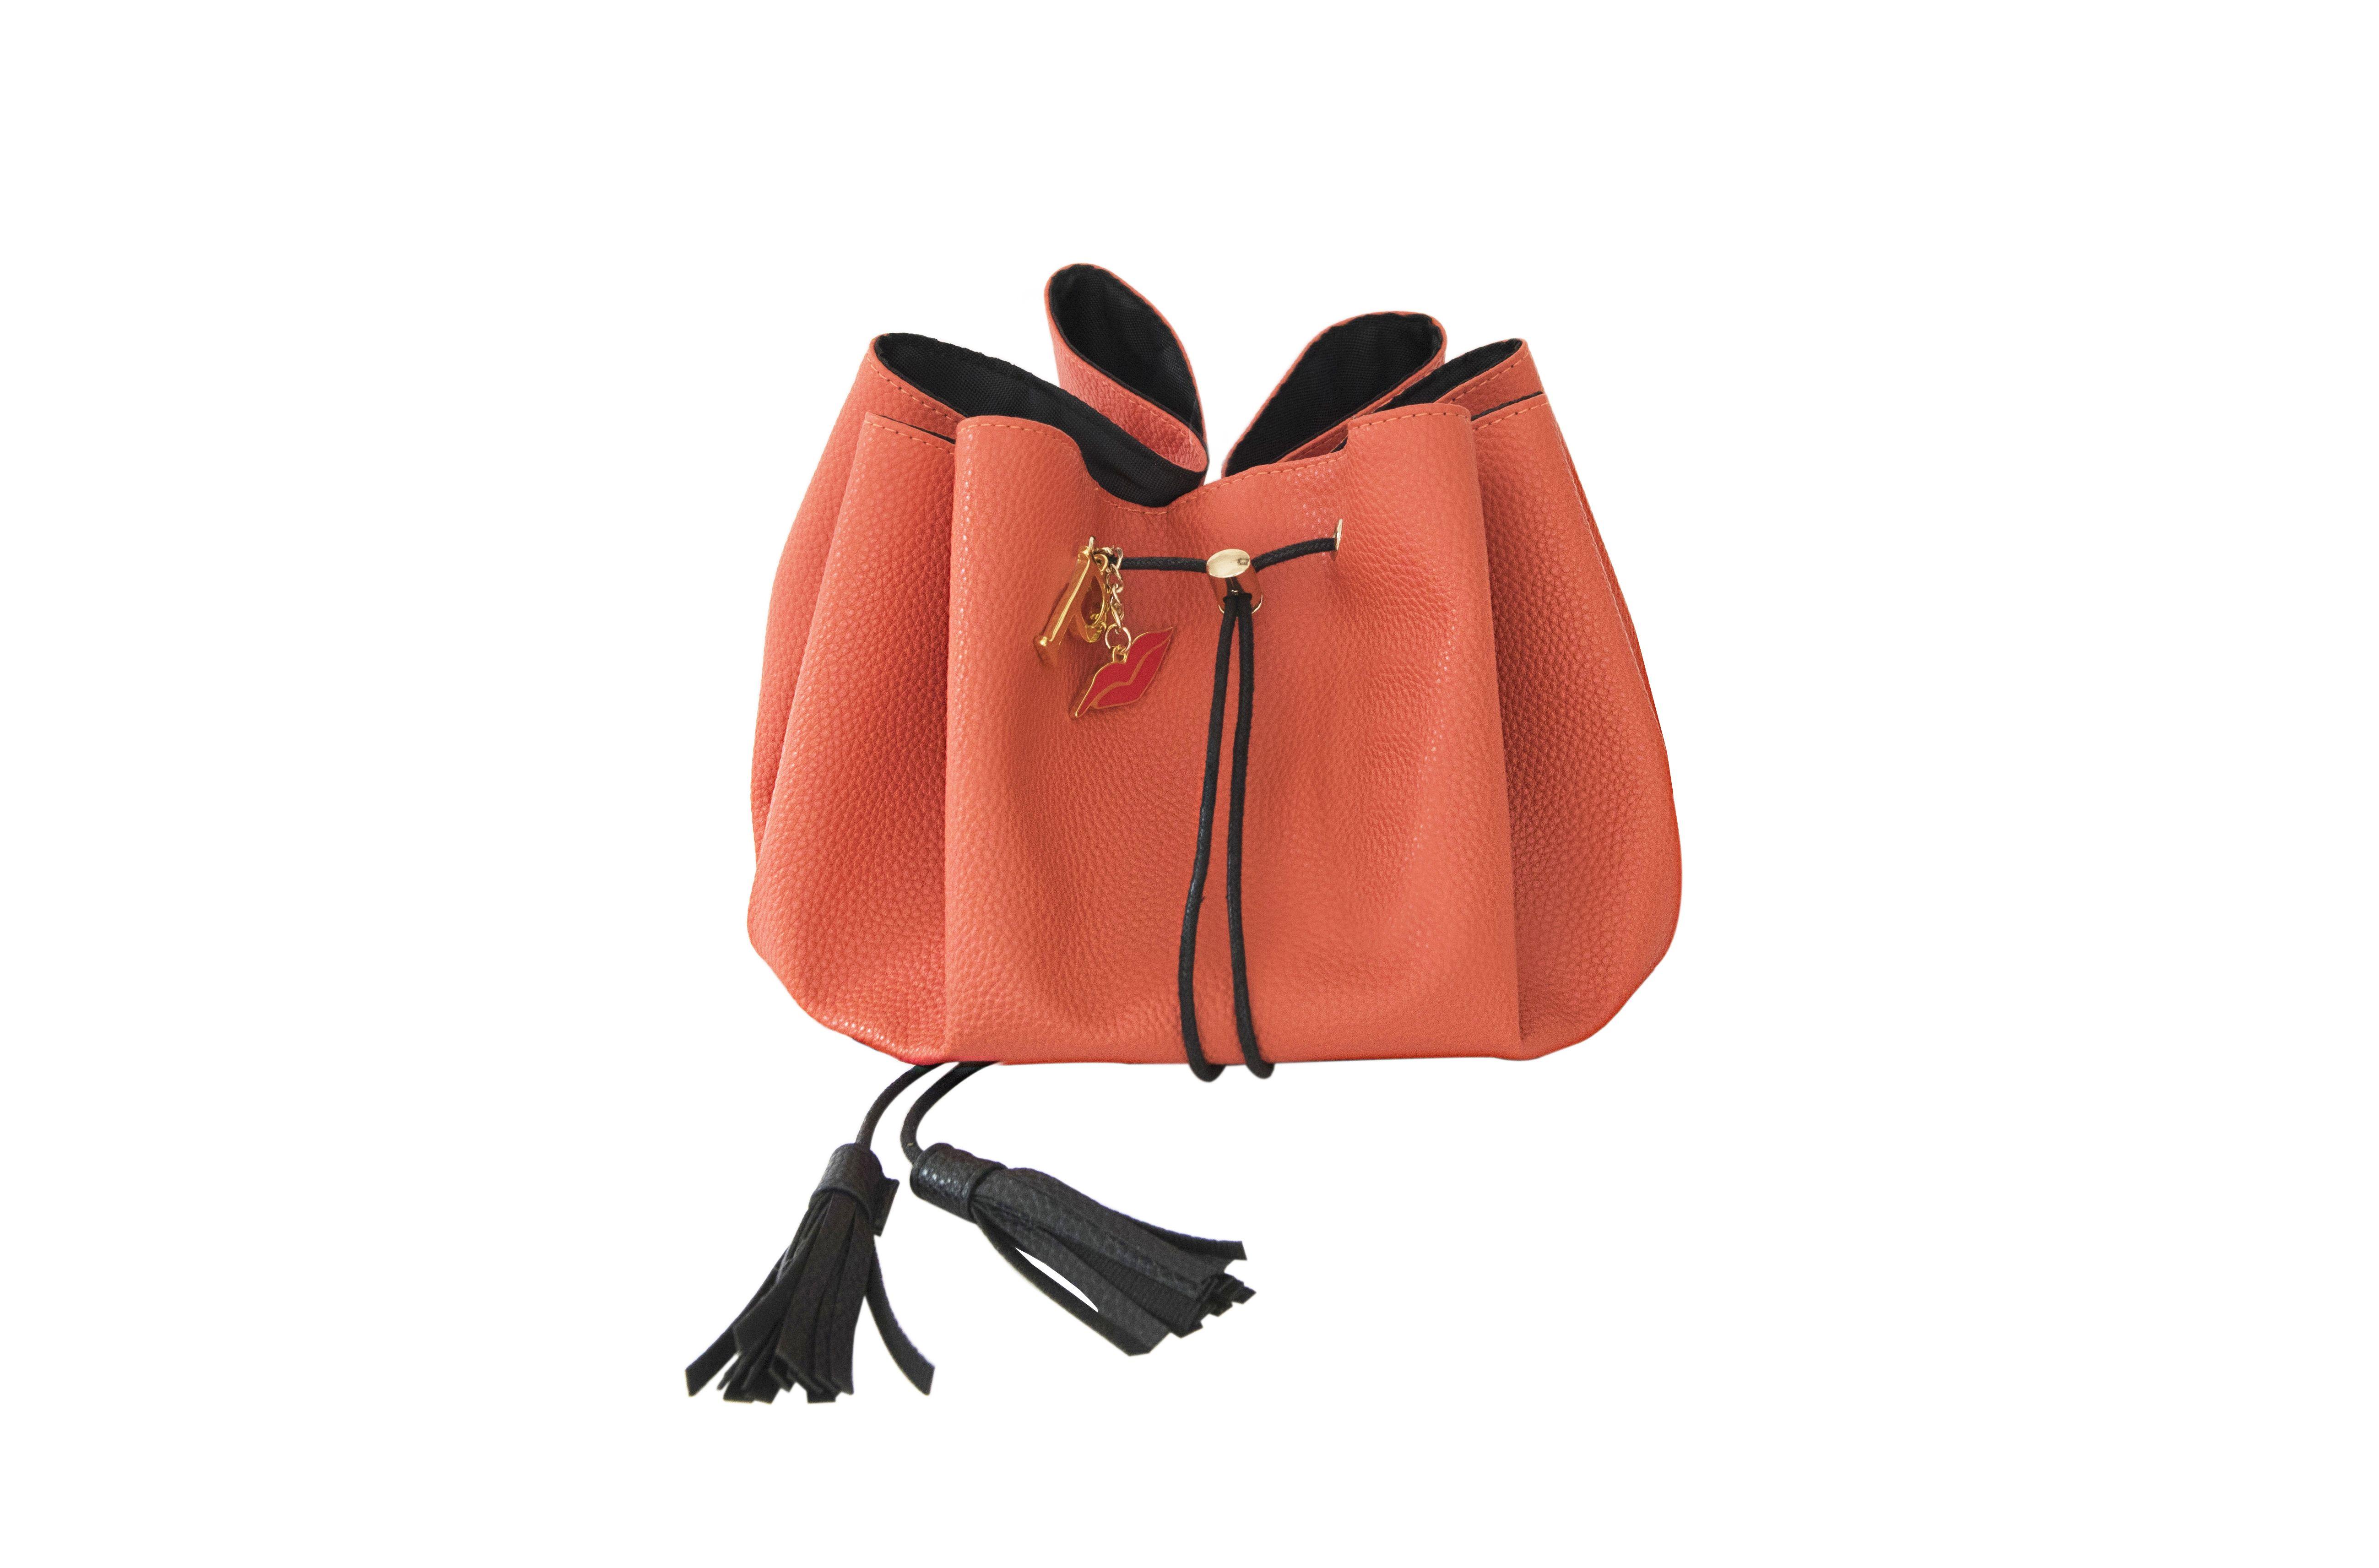 Lady Marmalade Vegan Leather Drawstring Makeup Bag